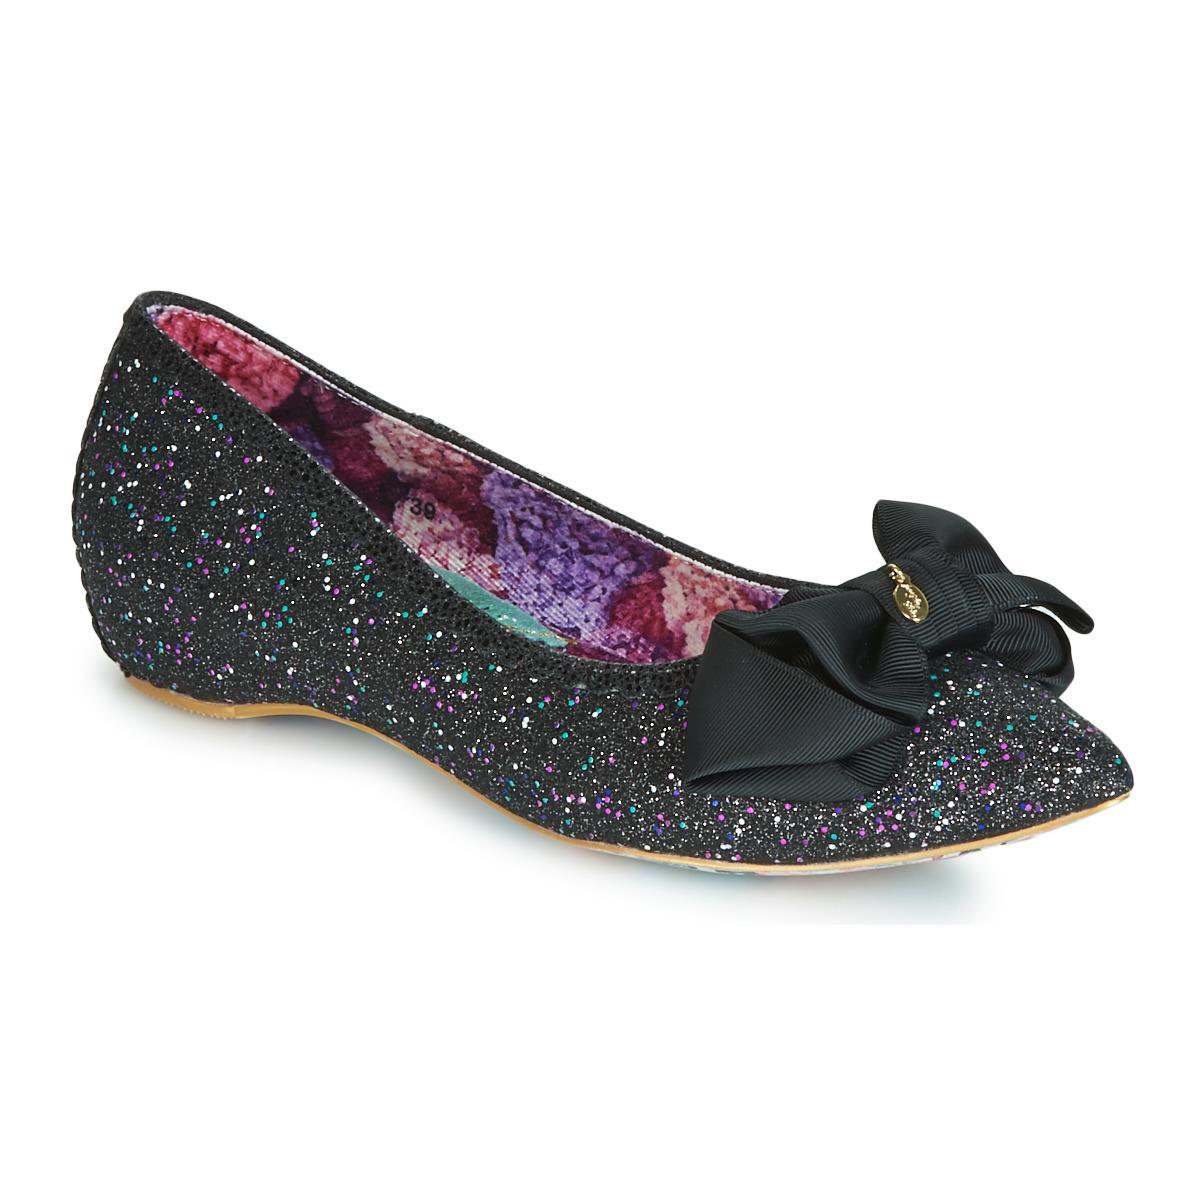 Low Heel Shoes M Irregular Choice Sulu Purple Slip On Flat